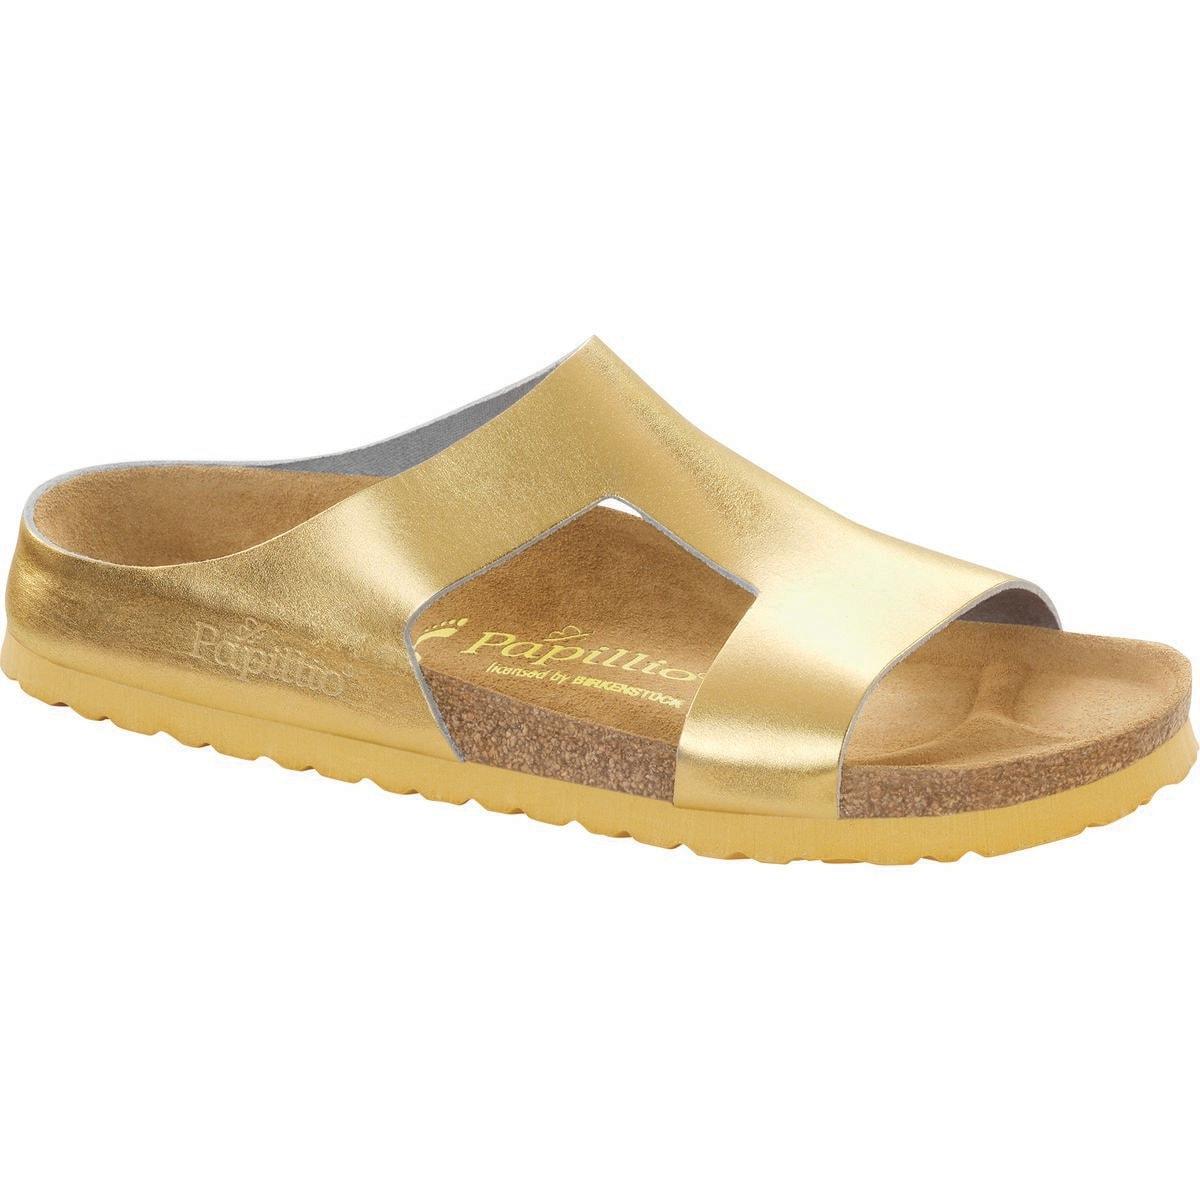 af73b8e5fe6a Birkenstock Charlize Papillio Narrow Sandal Womens